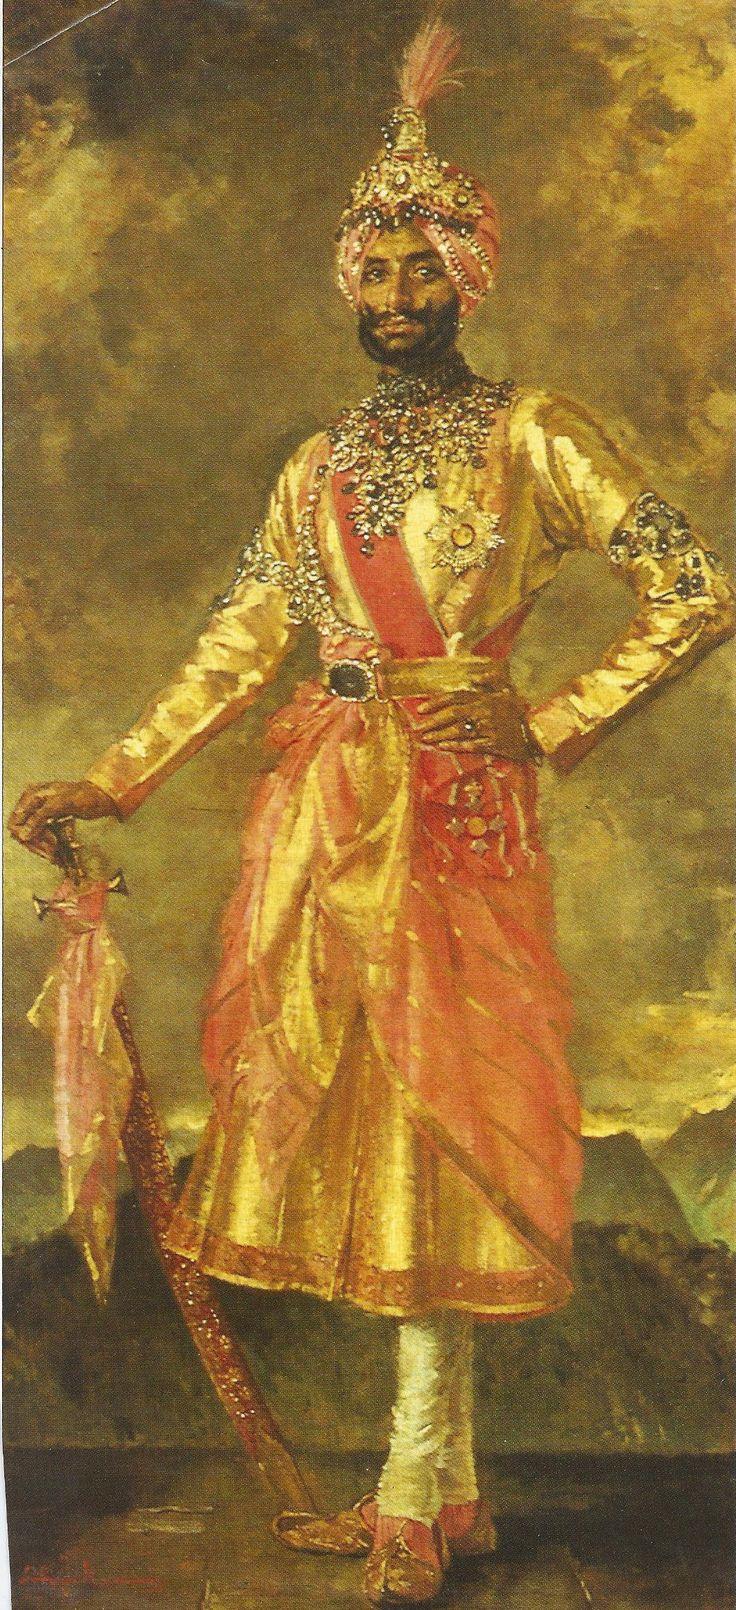 The Maharaja of Patiala